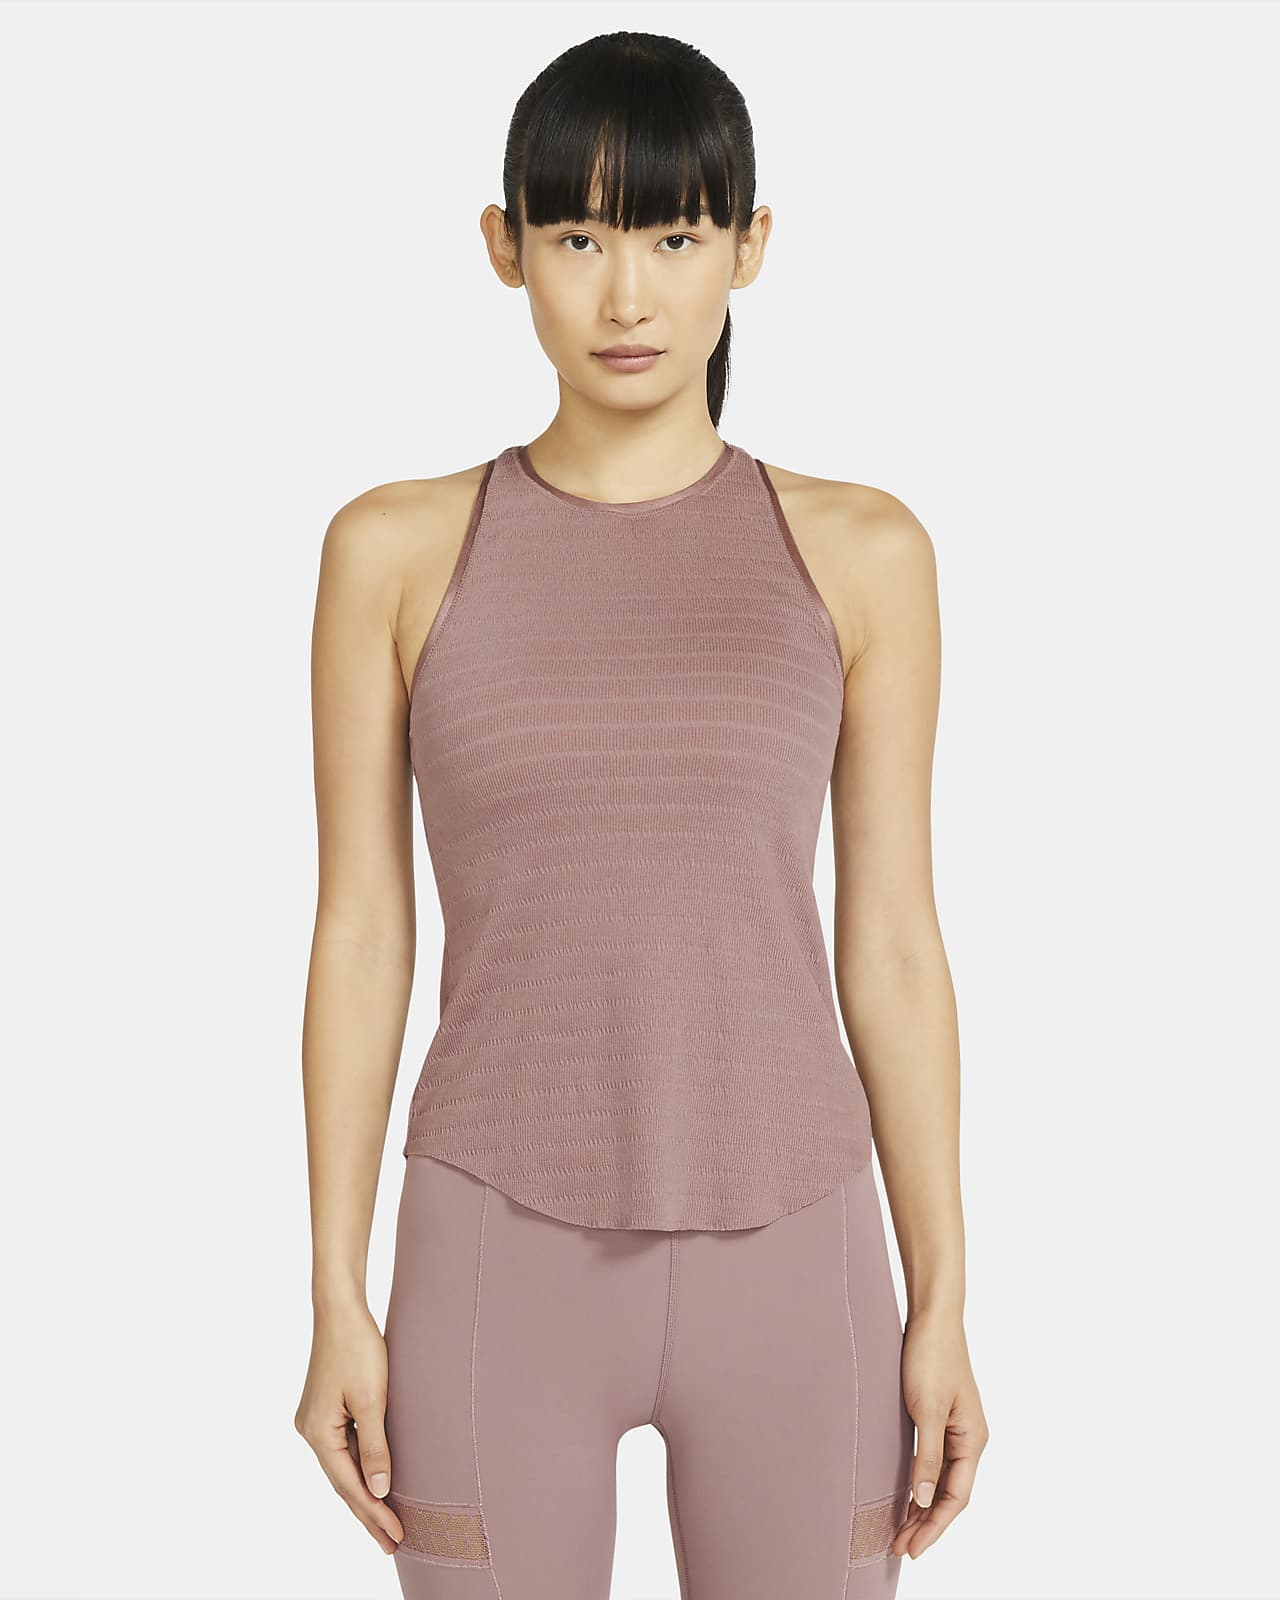 Nike Yoga 女子背心